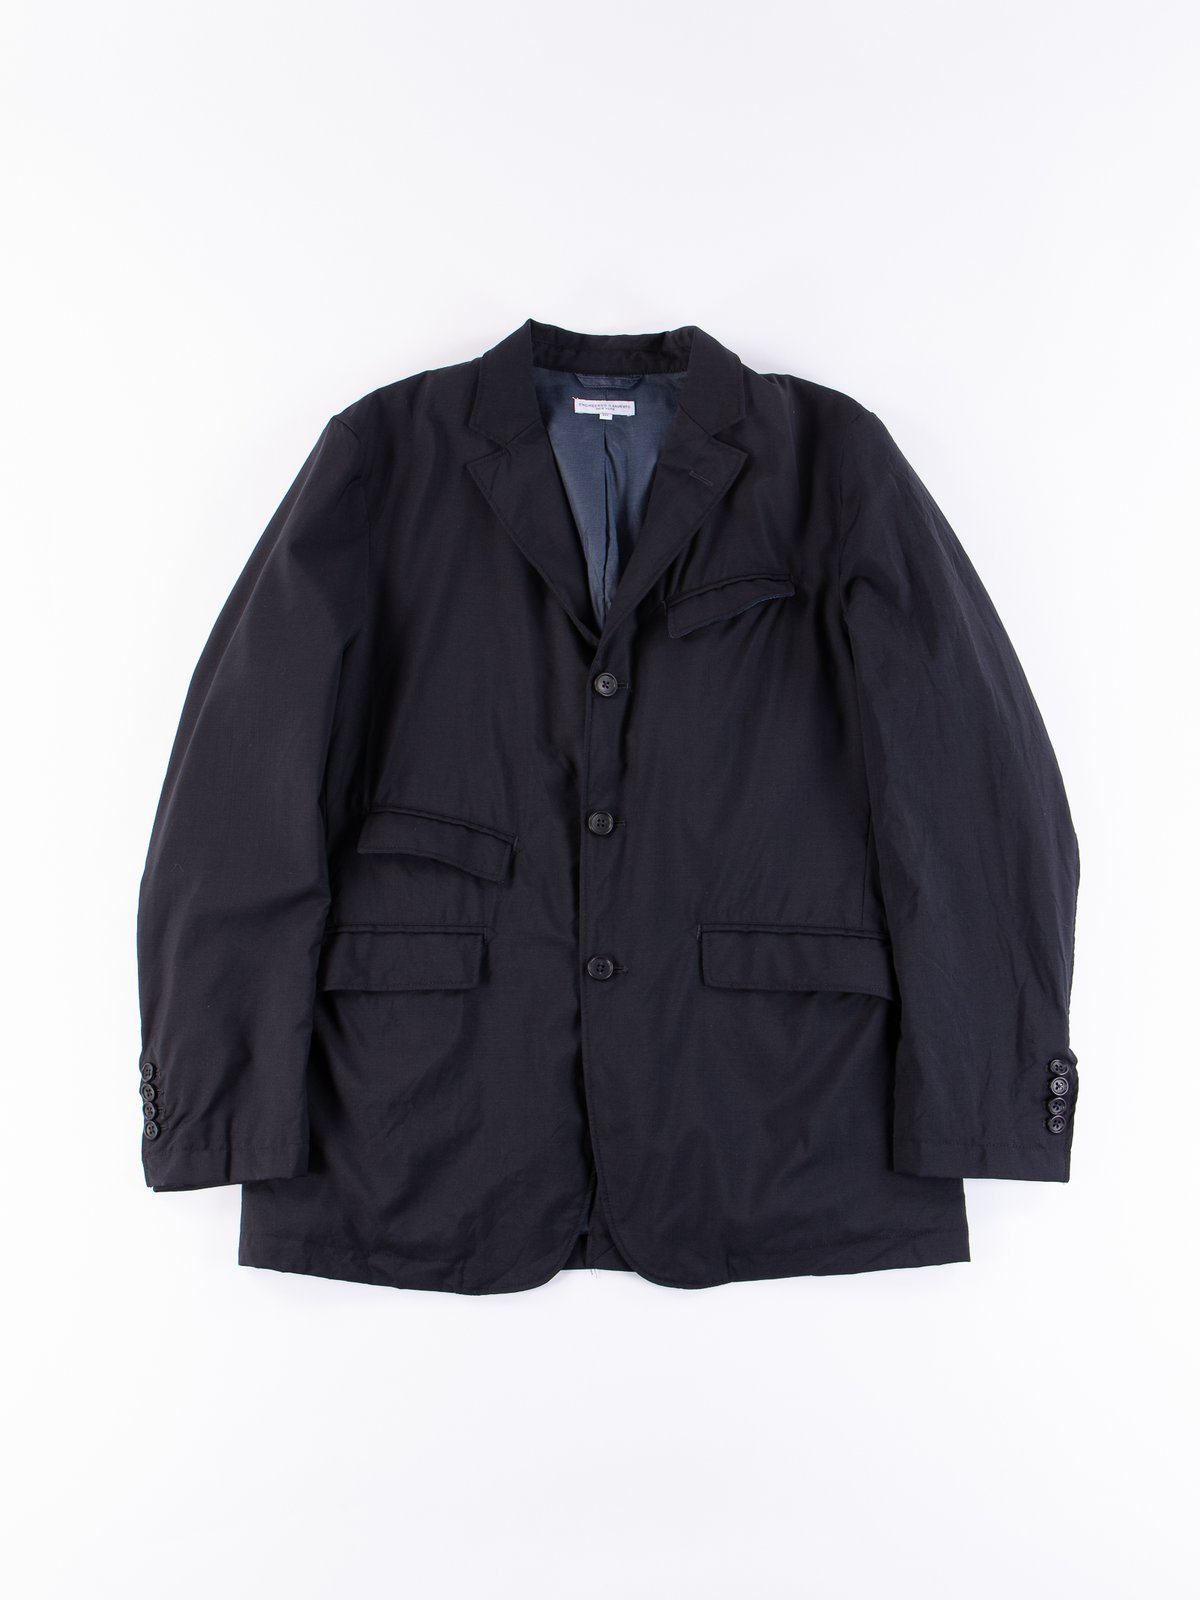 Dark Navy Tropical Wool Andover Jacket - Image 1